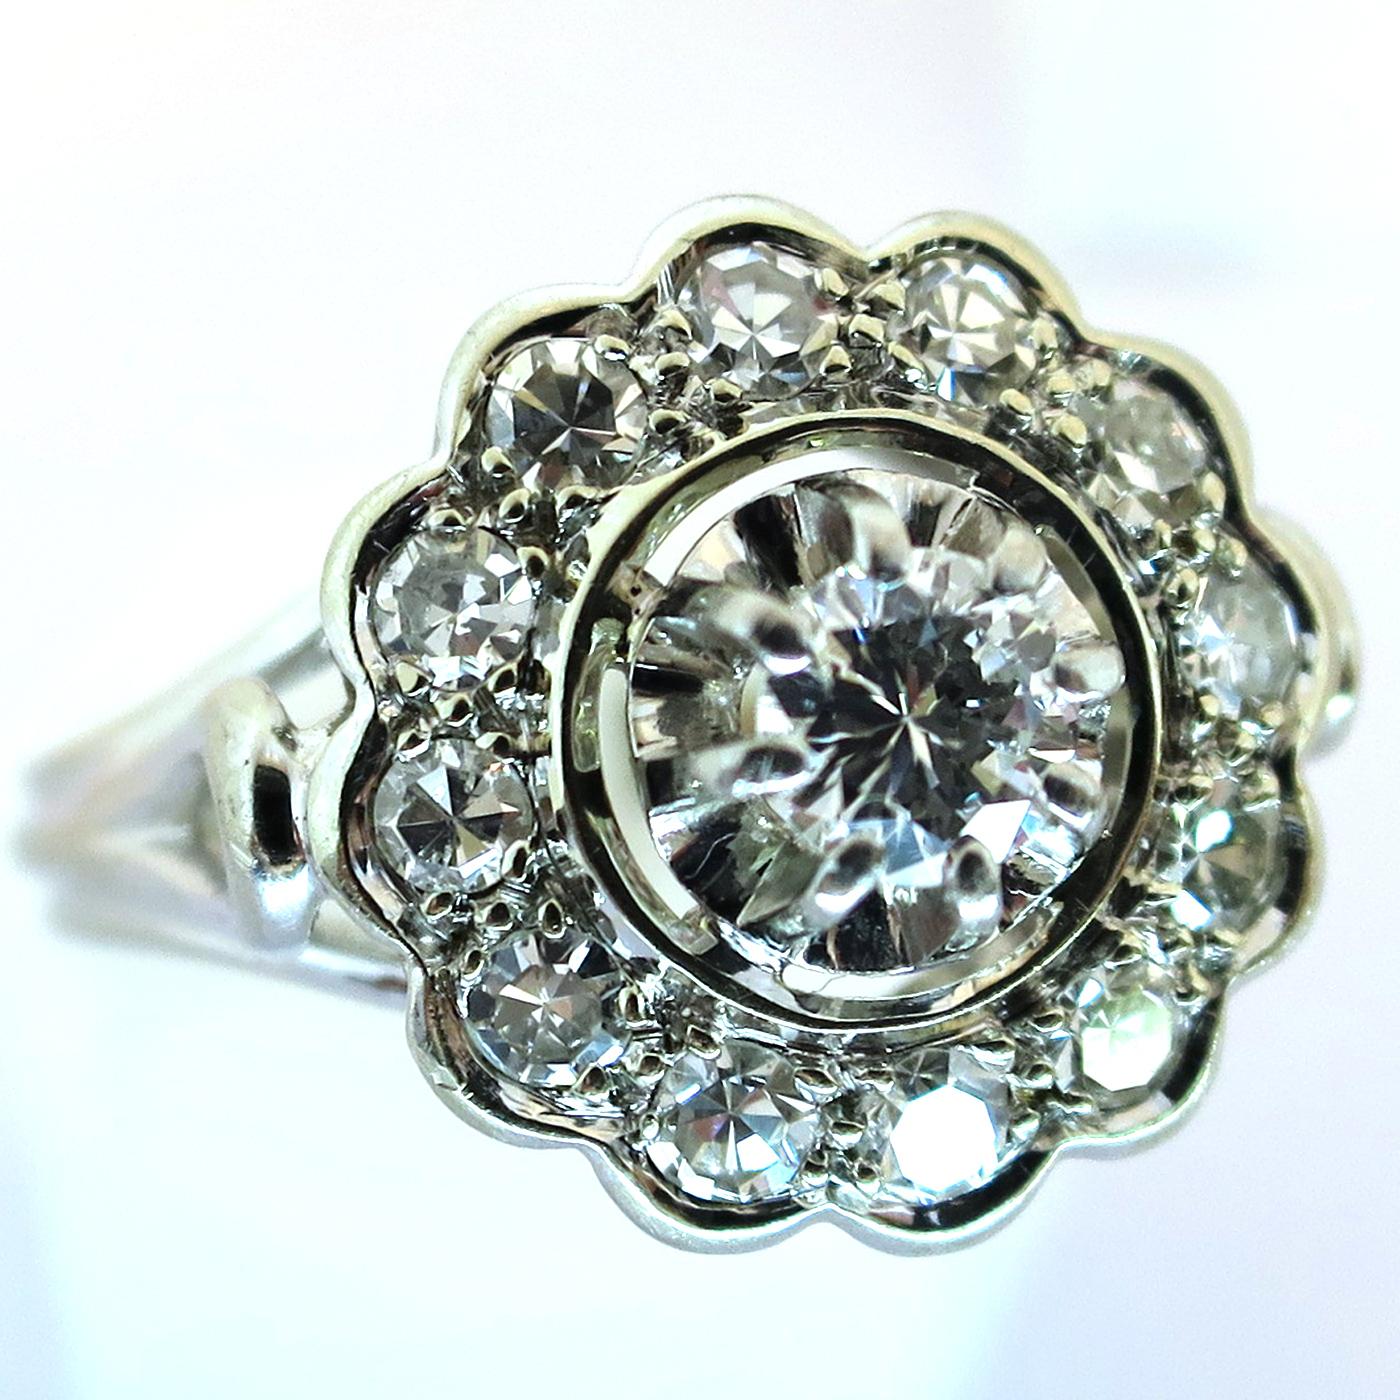 bijoux anciens occasion bague diamants ancienne forme. Black Bedroom Furniture Sets. Home Design Ideas